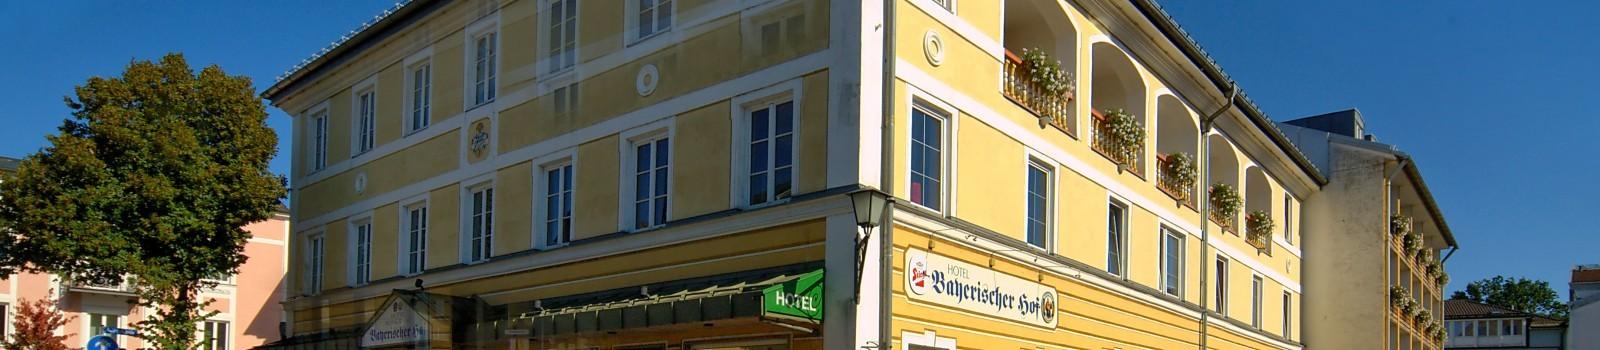 Bayerischer Hof Prien